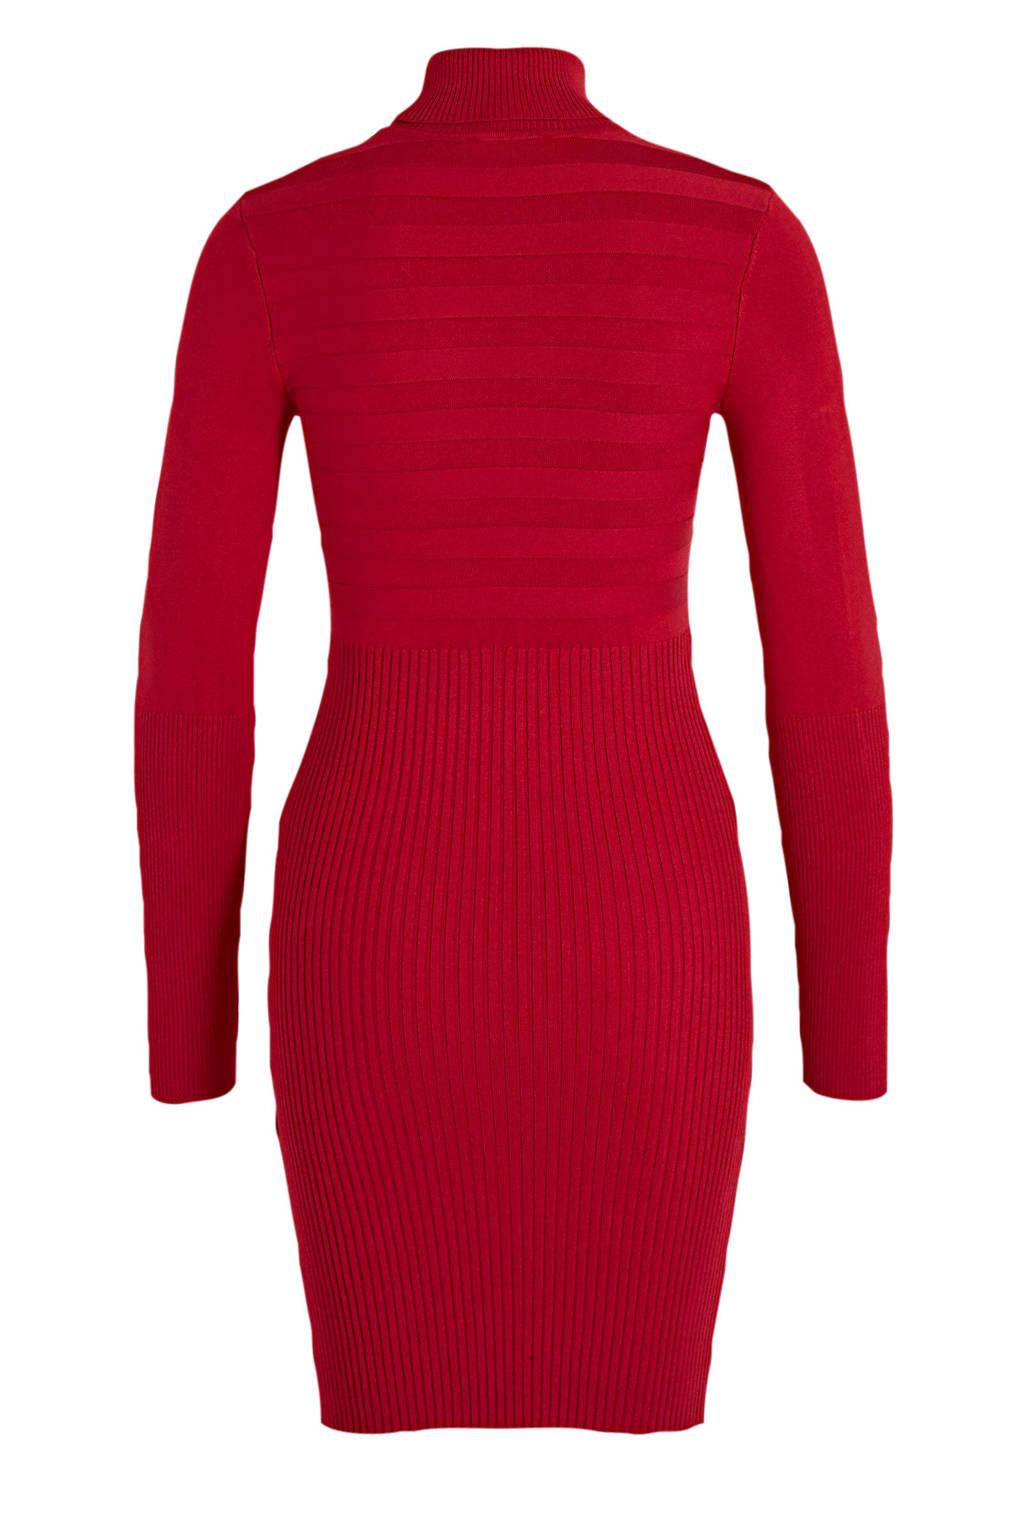 Morgan jersey jurk rood, Roodroze